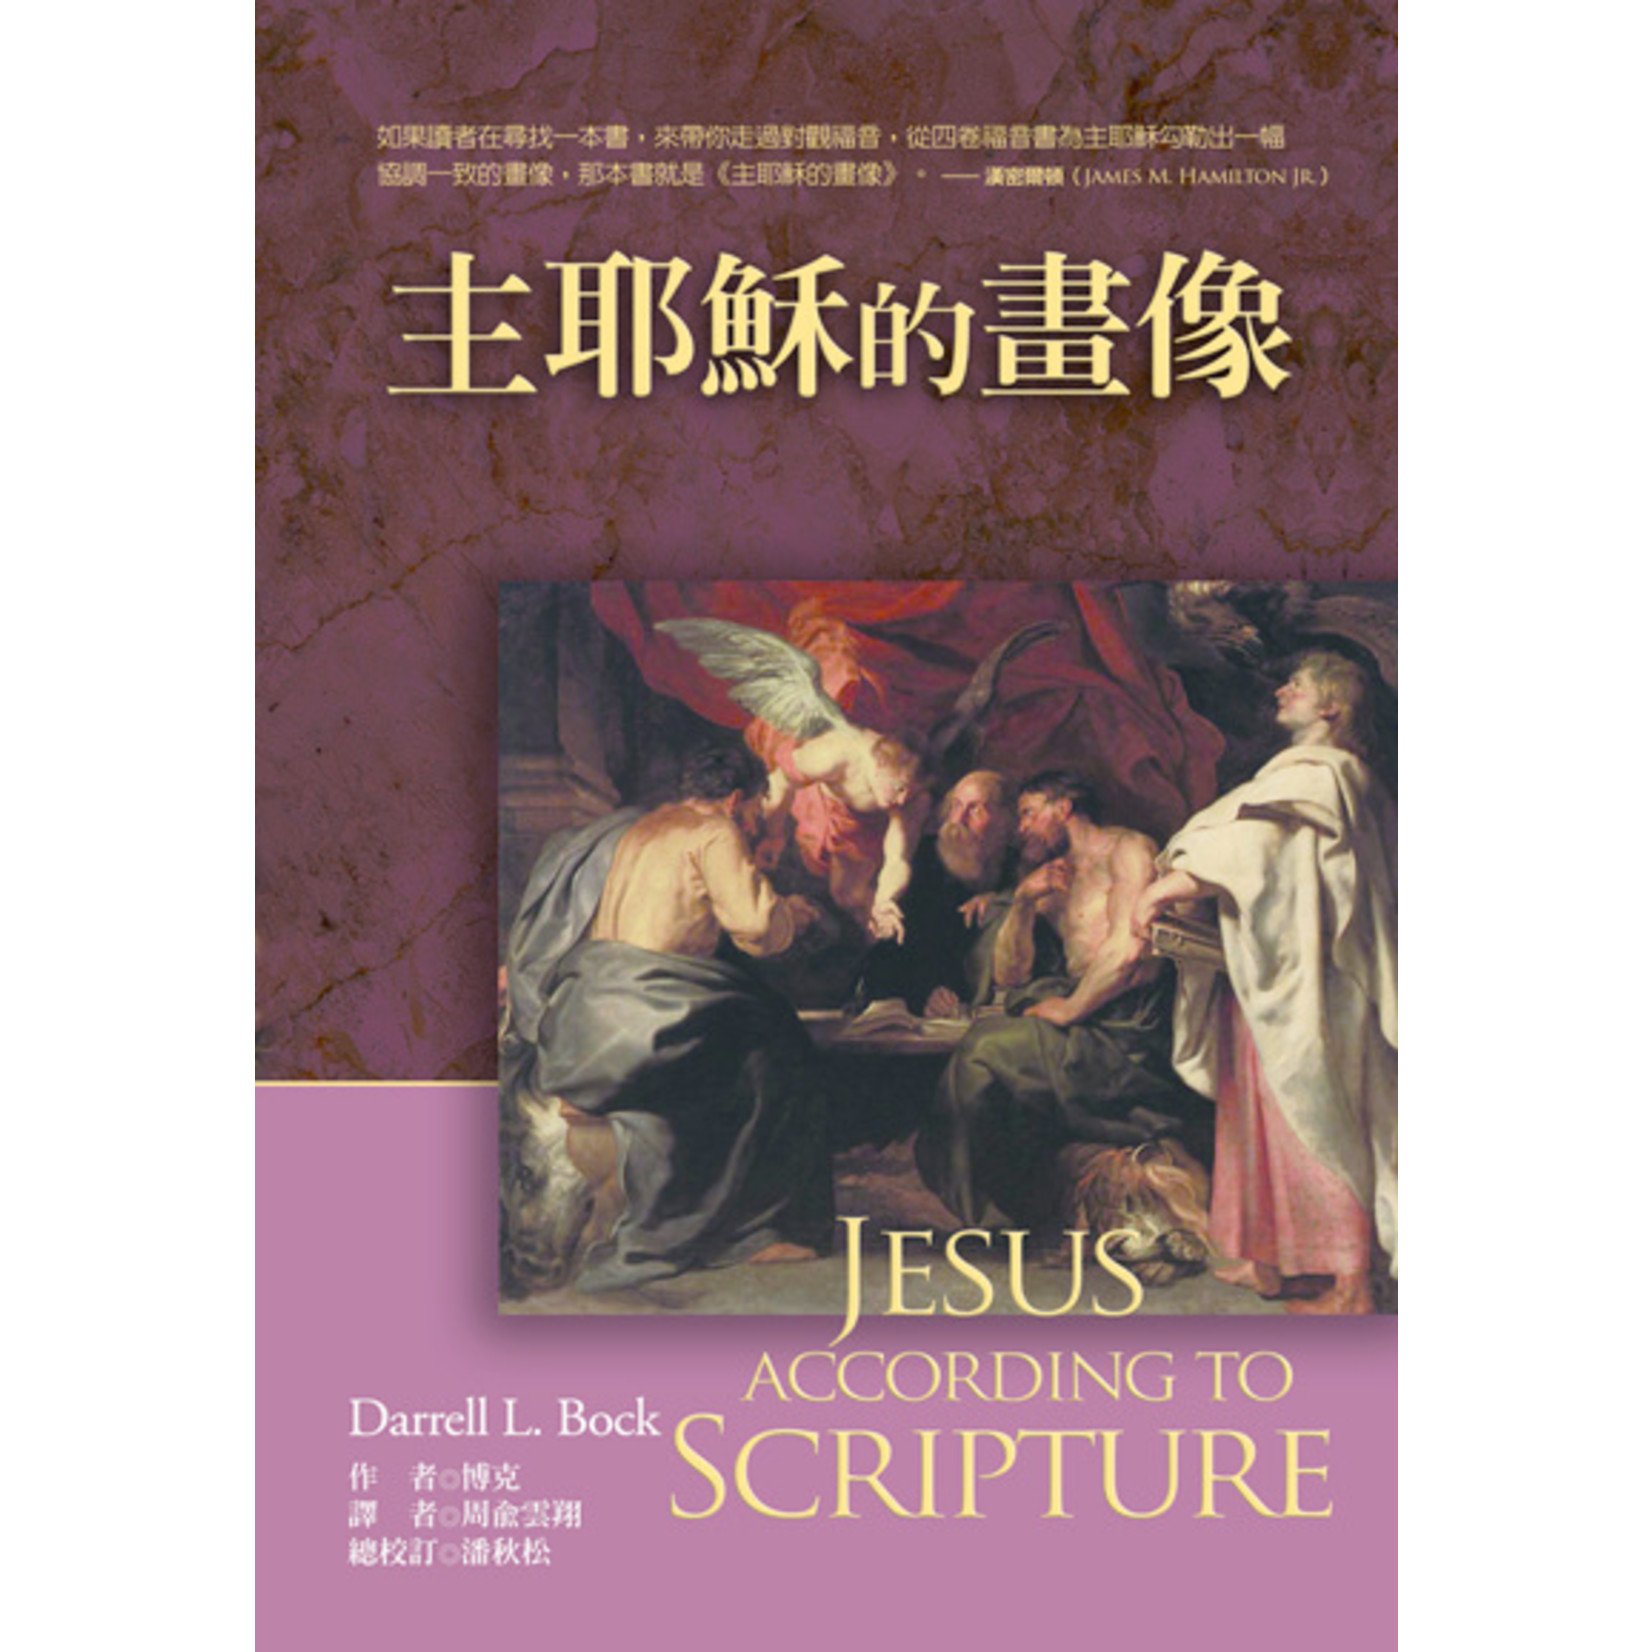 美國麥種傳道會 AKOWCM 主耶穌的畫像 Jesus According to Scripture